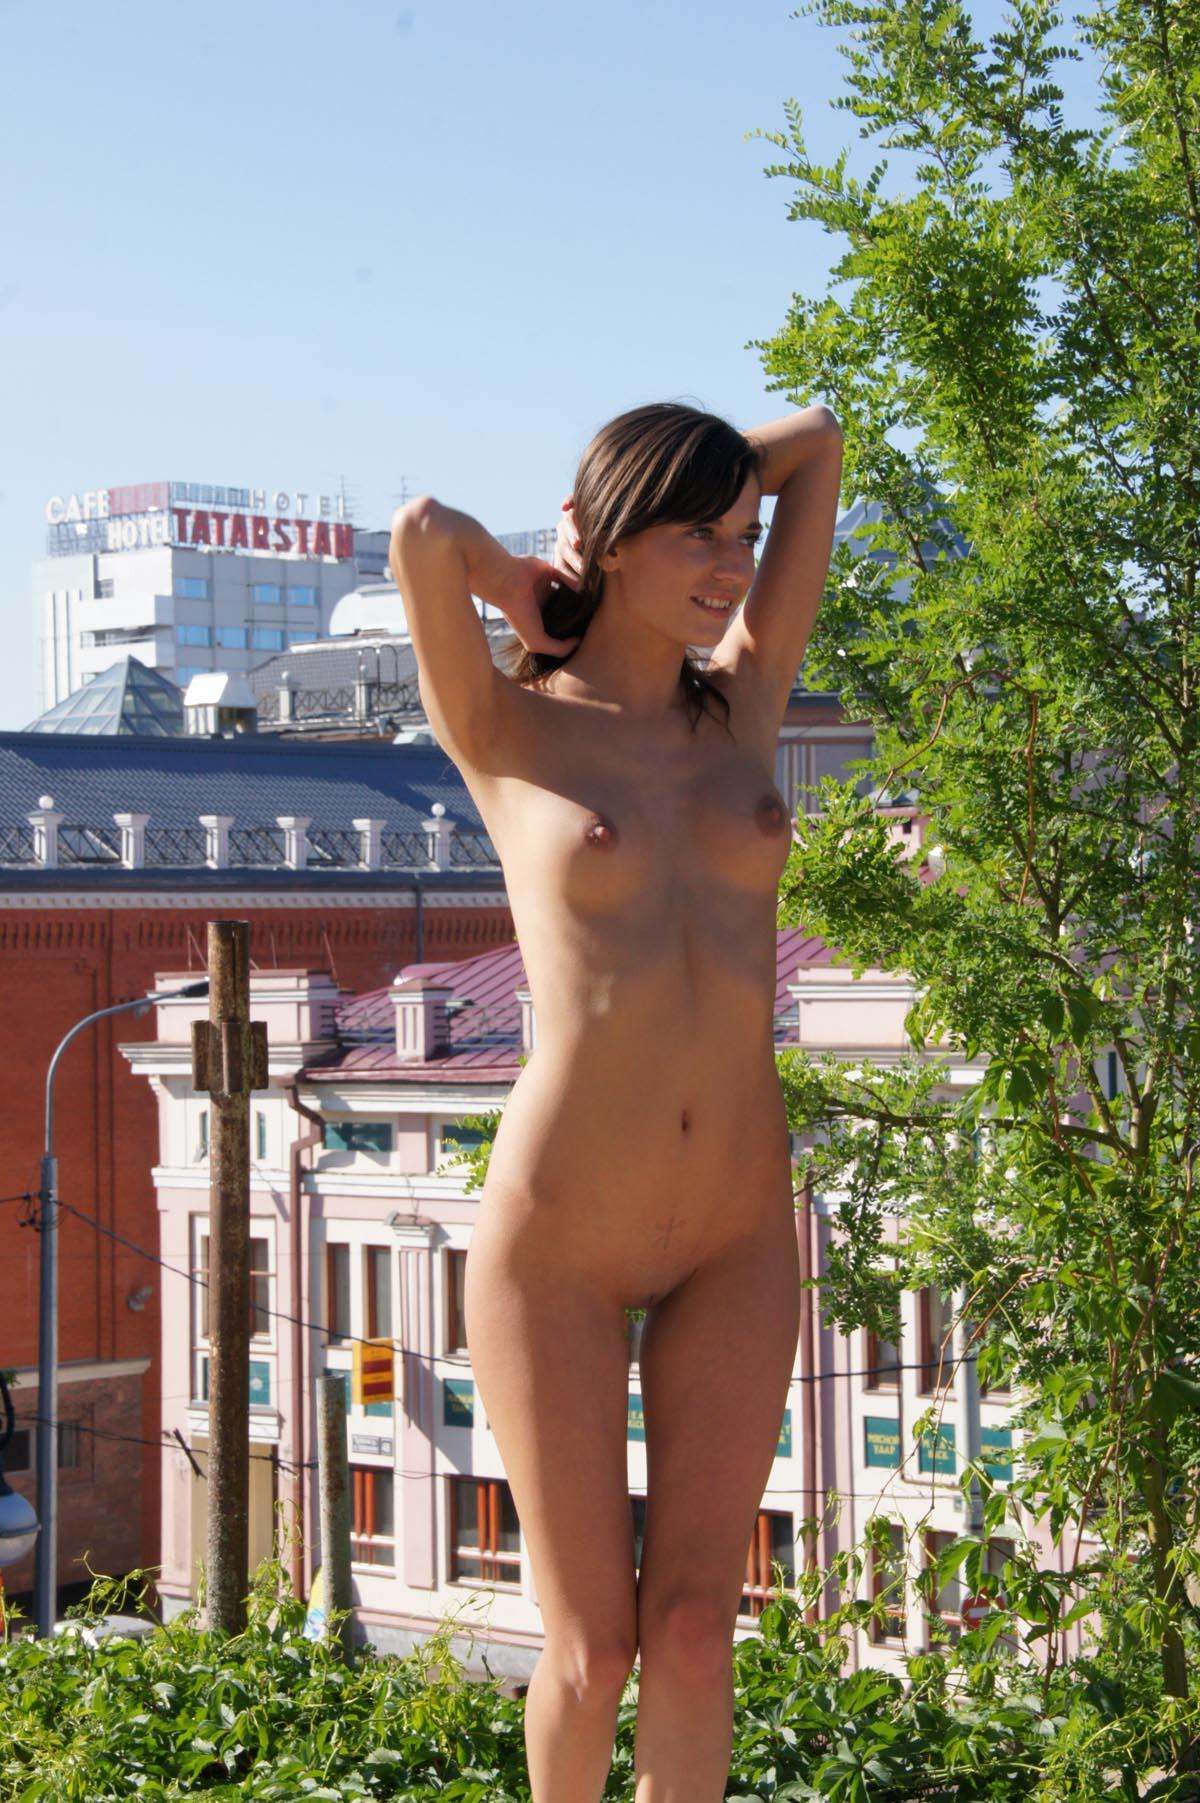 irina-k-naked-in-russia-kazan-nude-public-30